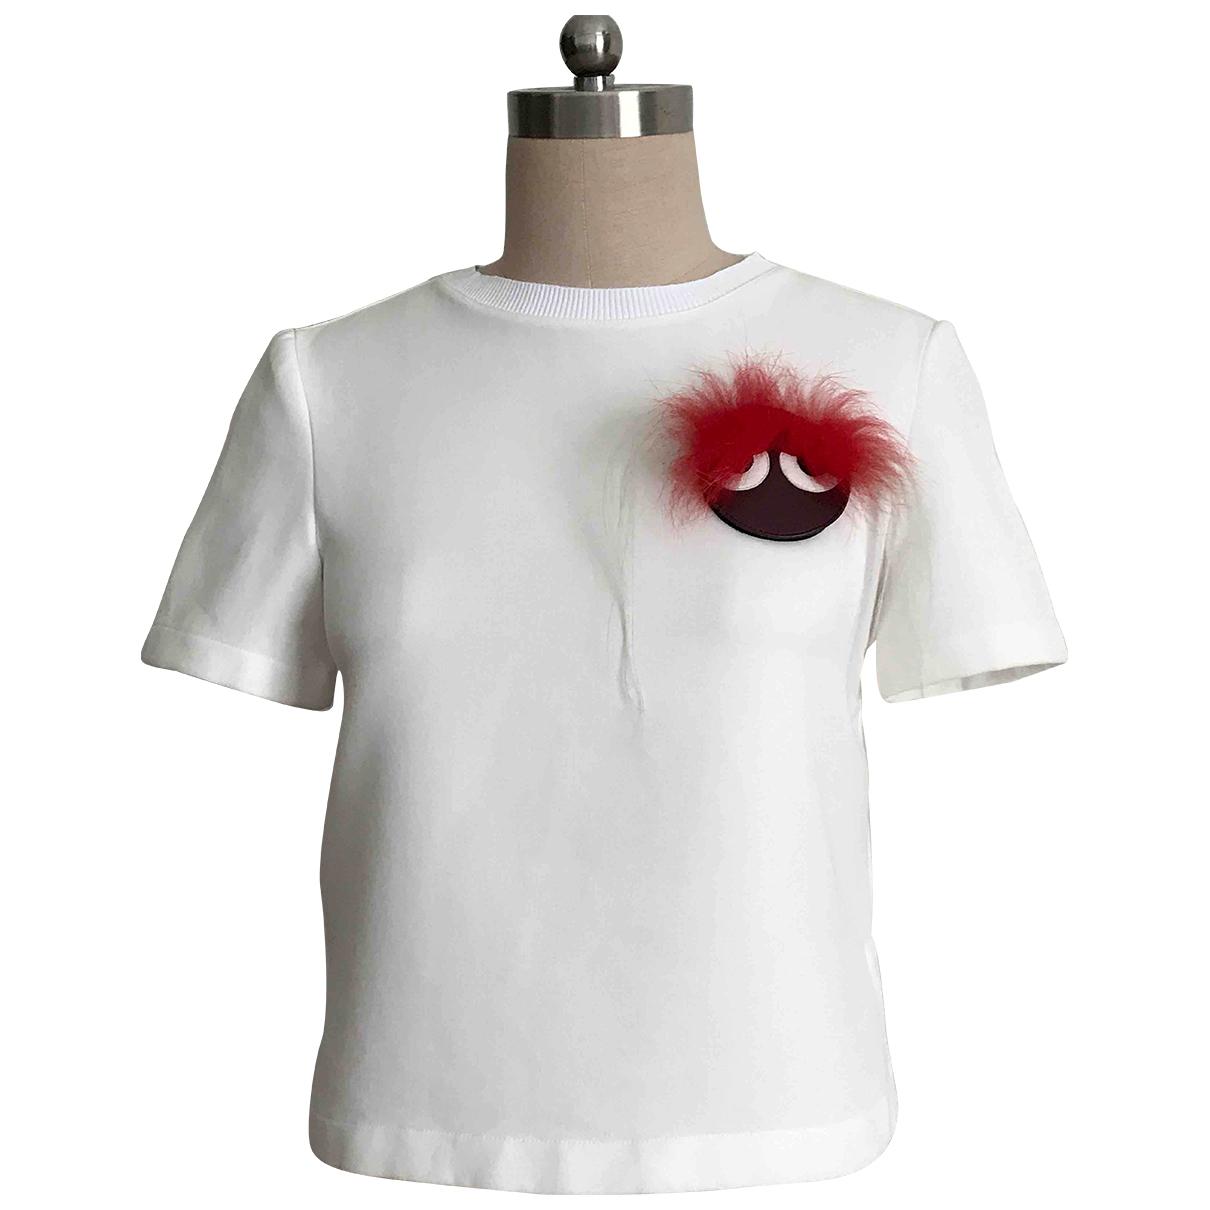 Fendi \N White Cotton  top for Women S International